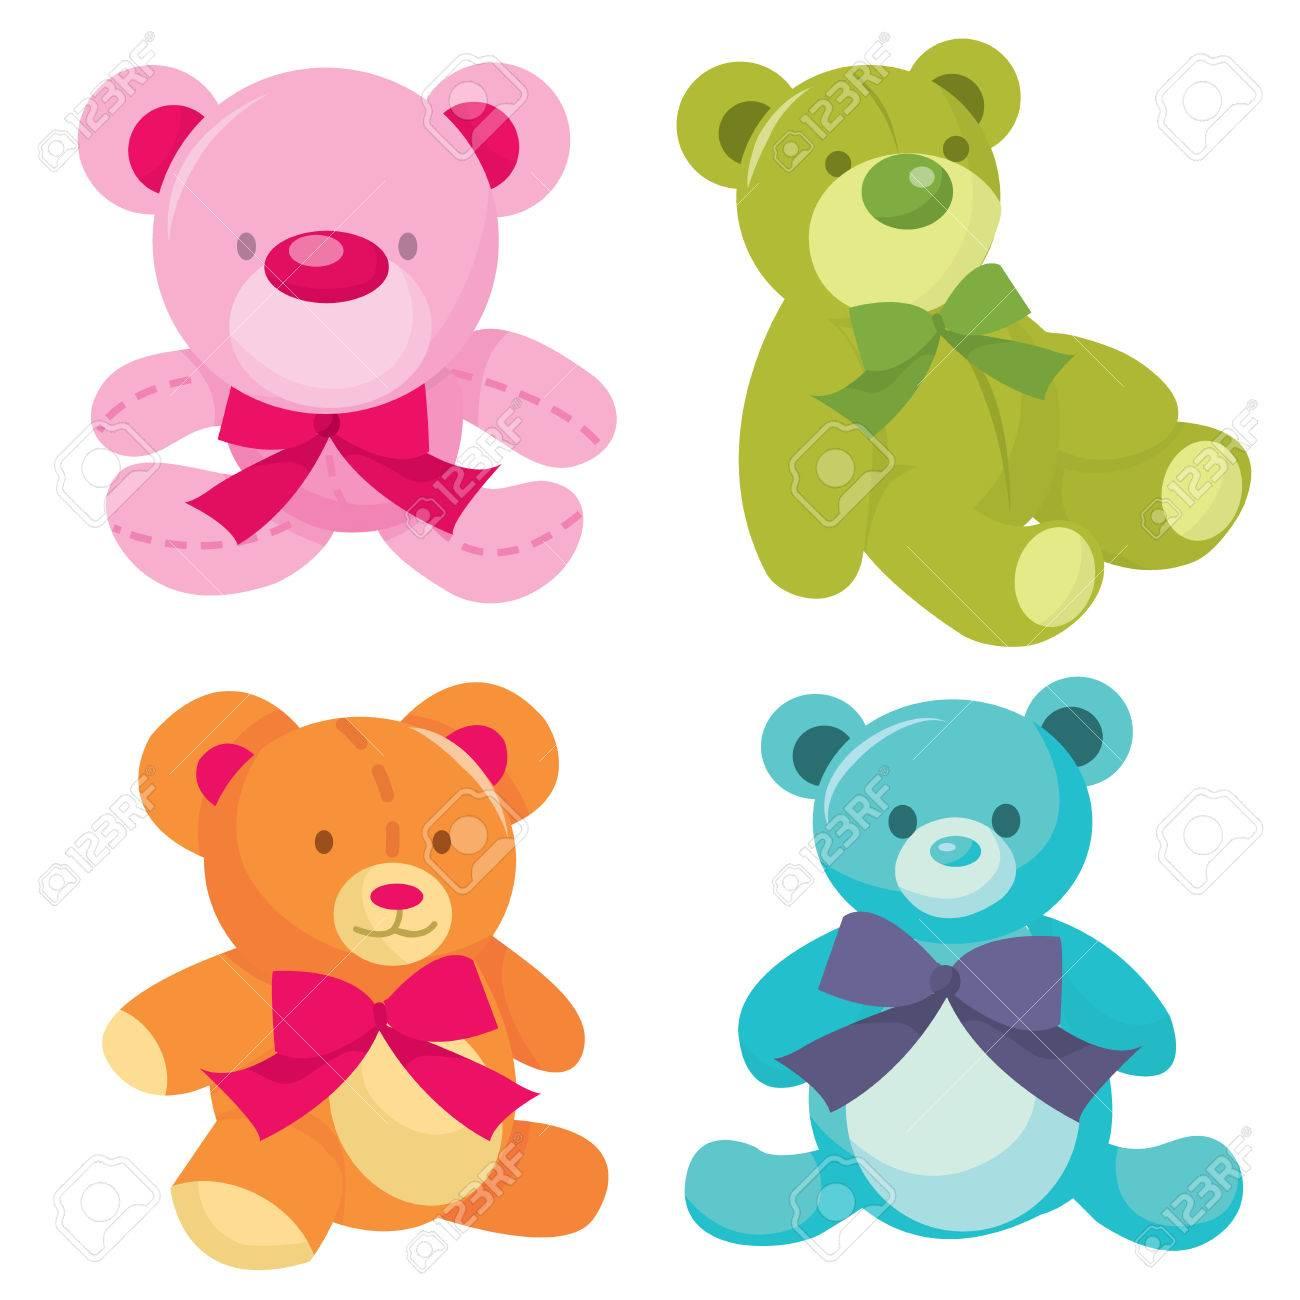 teddy bears vector  A Set Of Four Cute Teddy Bears Vector Illustration In Different ...